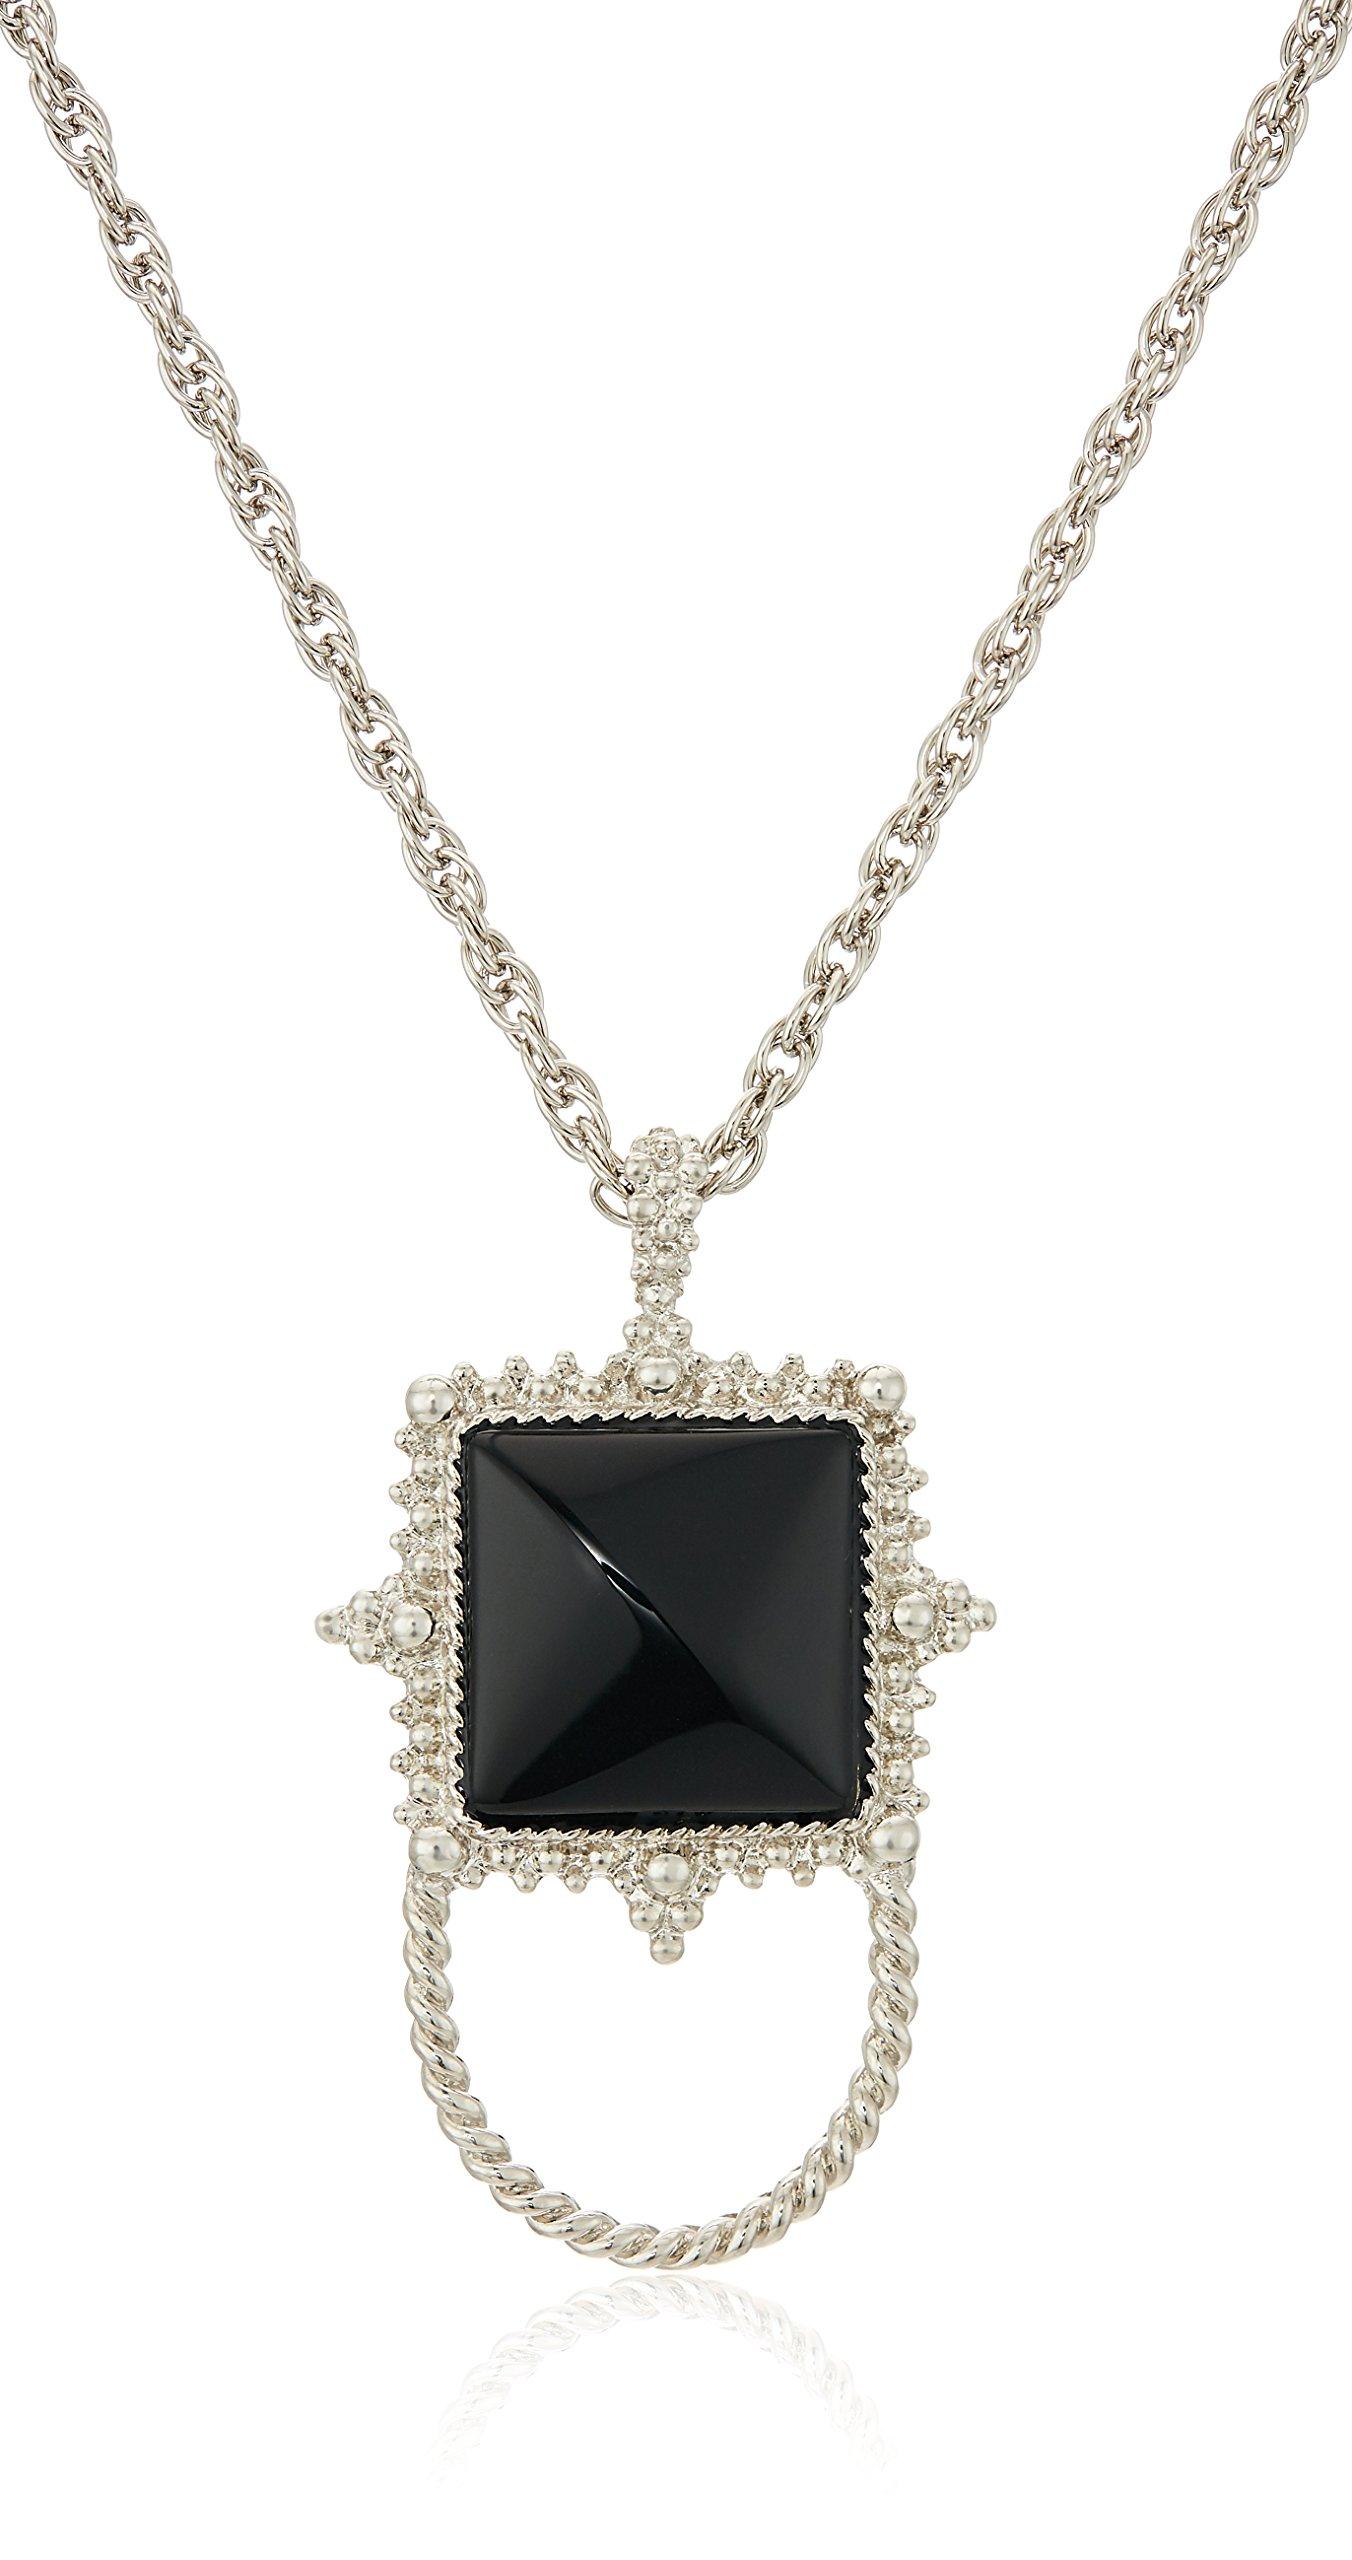 1928 Jewelry Womens Silver-Tone Semi-Precious Onyx Square Eyeglass/Badge Holder Pendant Enhancer, black, 30